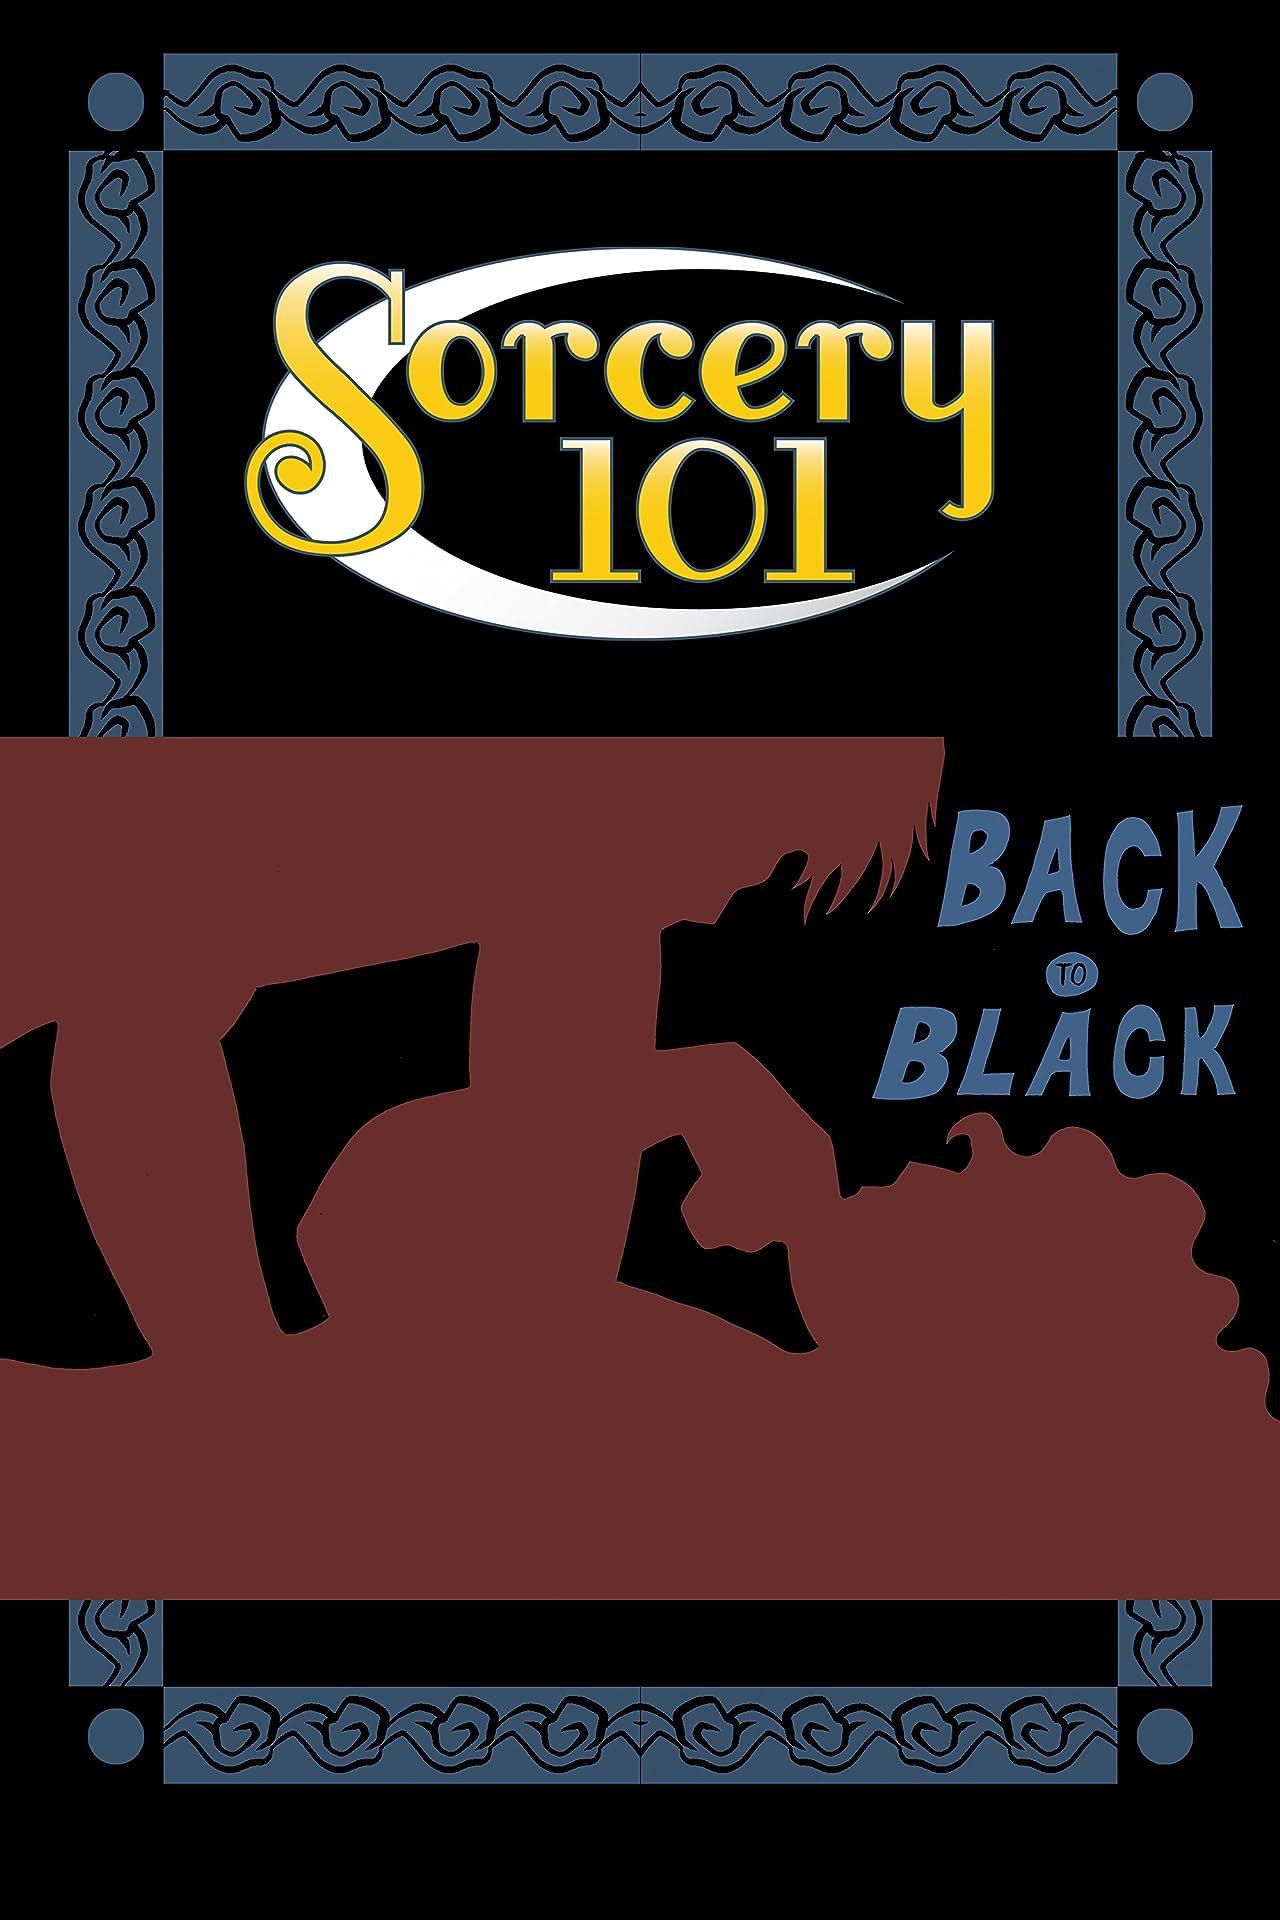 Sorcery 101 #42